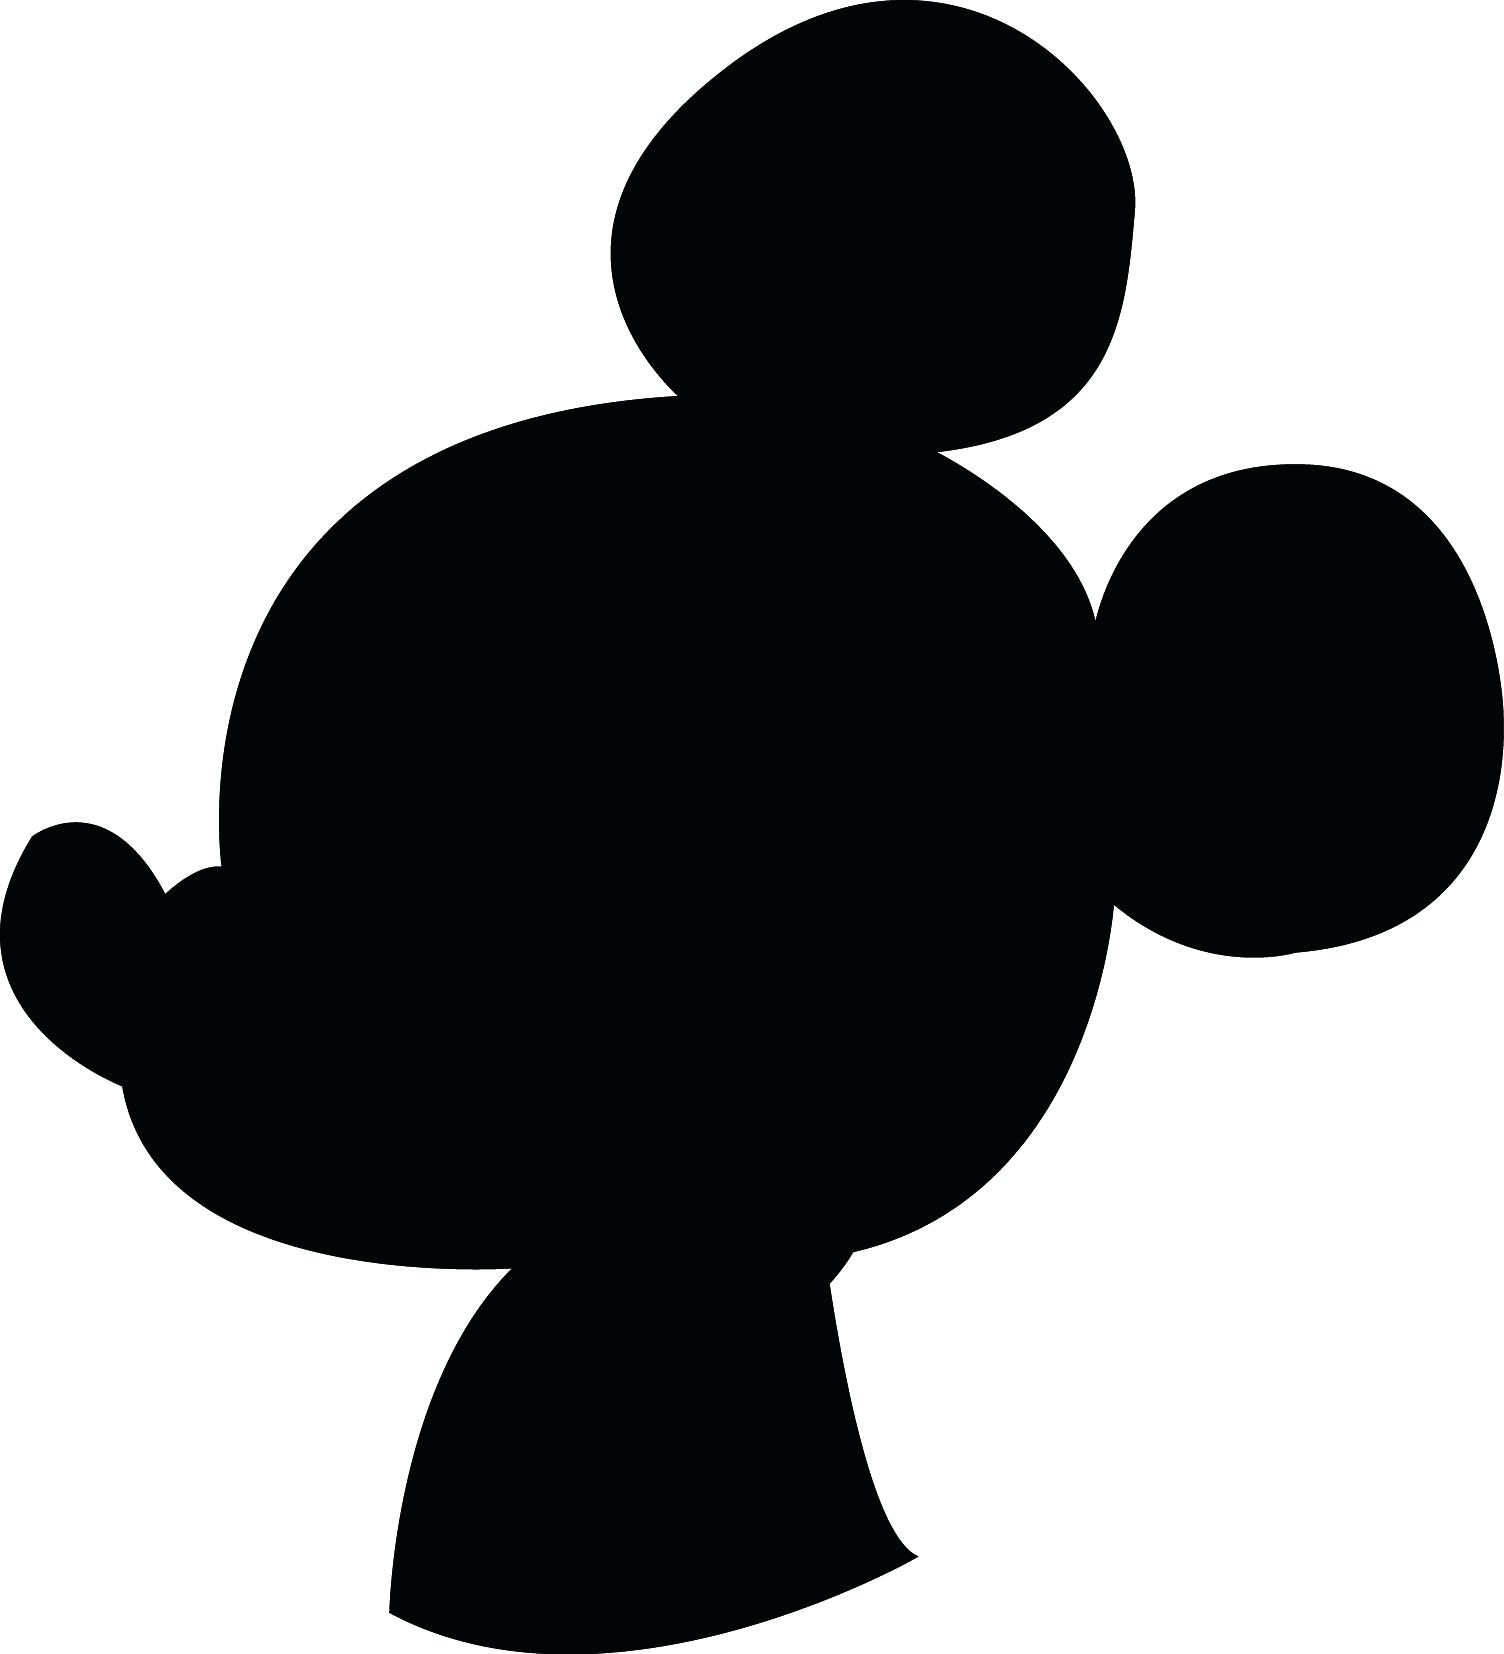 1504x1654 Printable Minnie Mouse Head Silhouette Printable Silhouettes